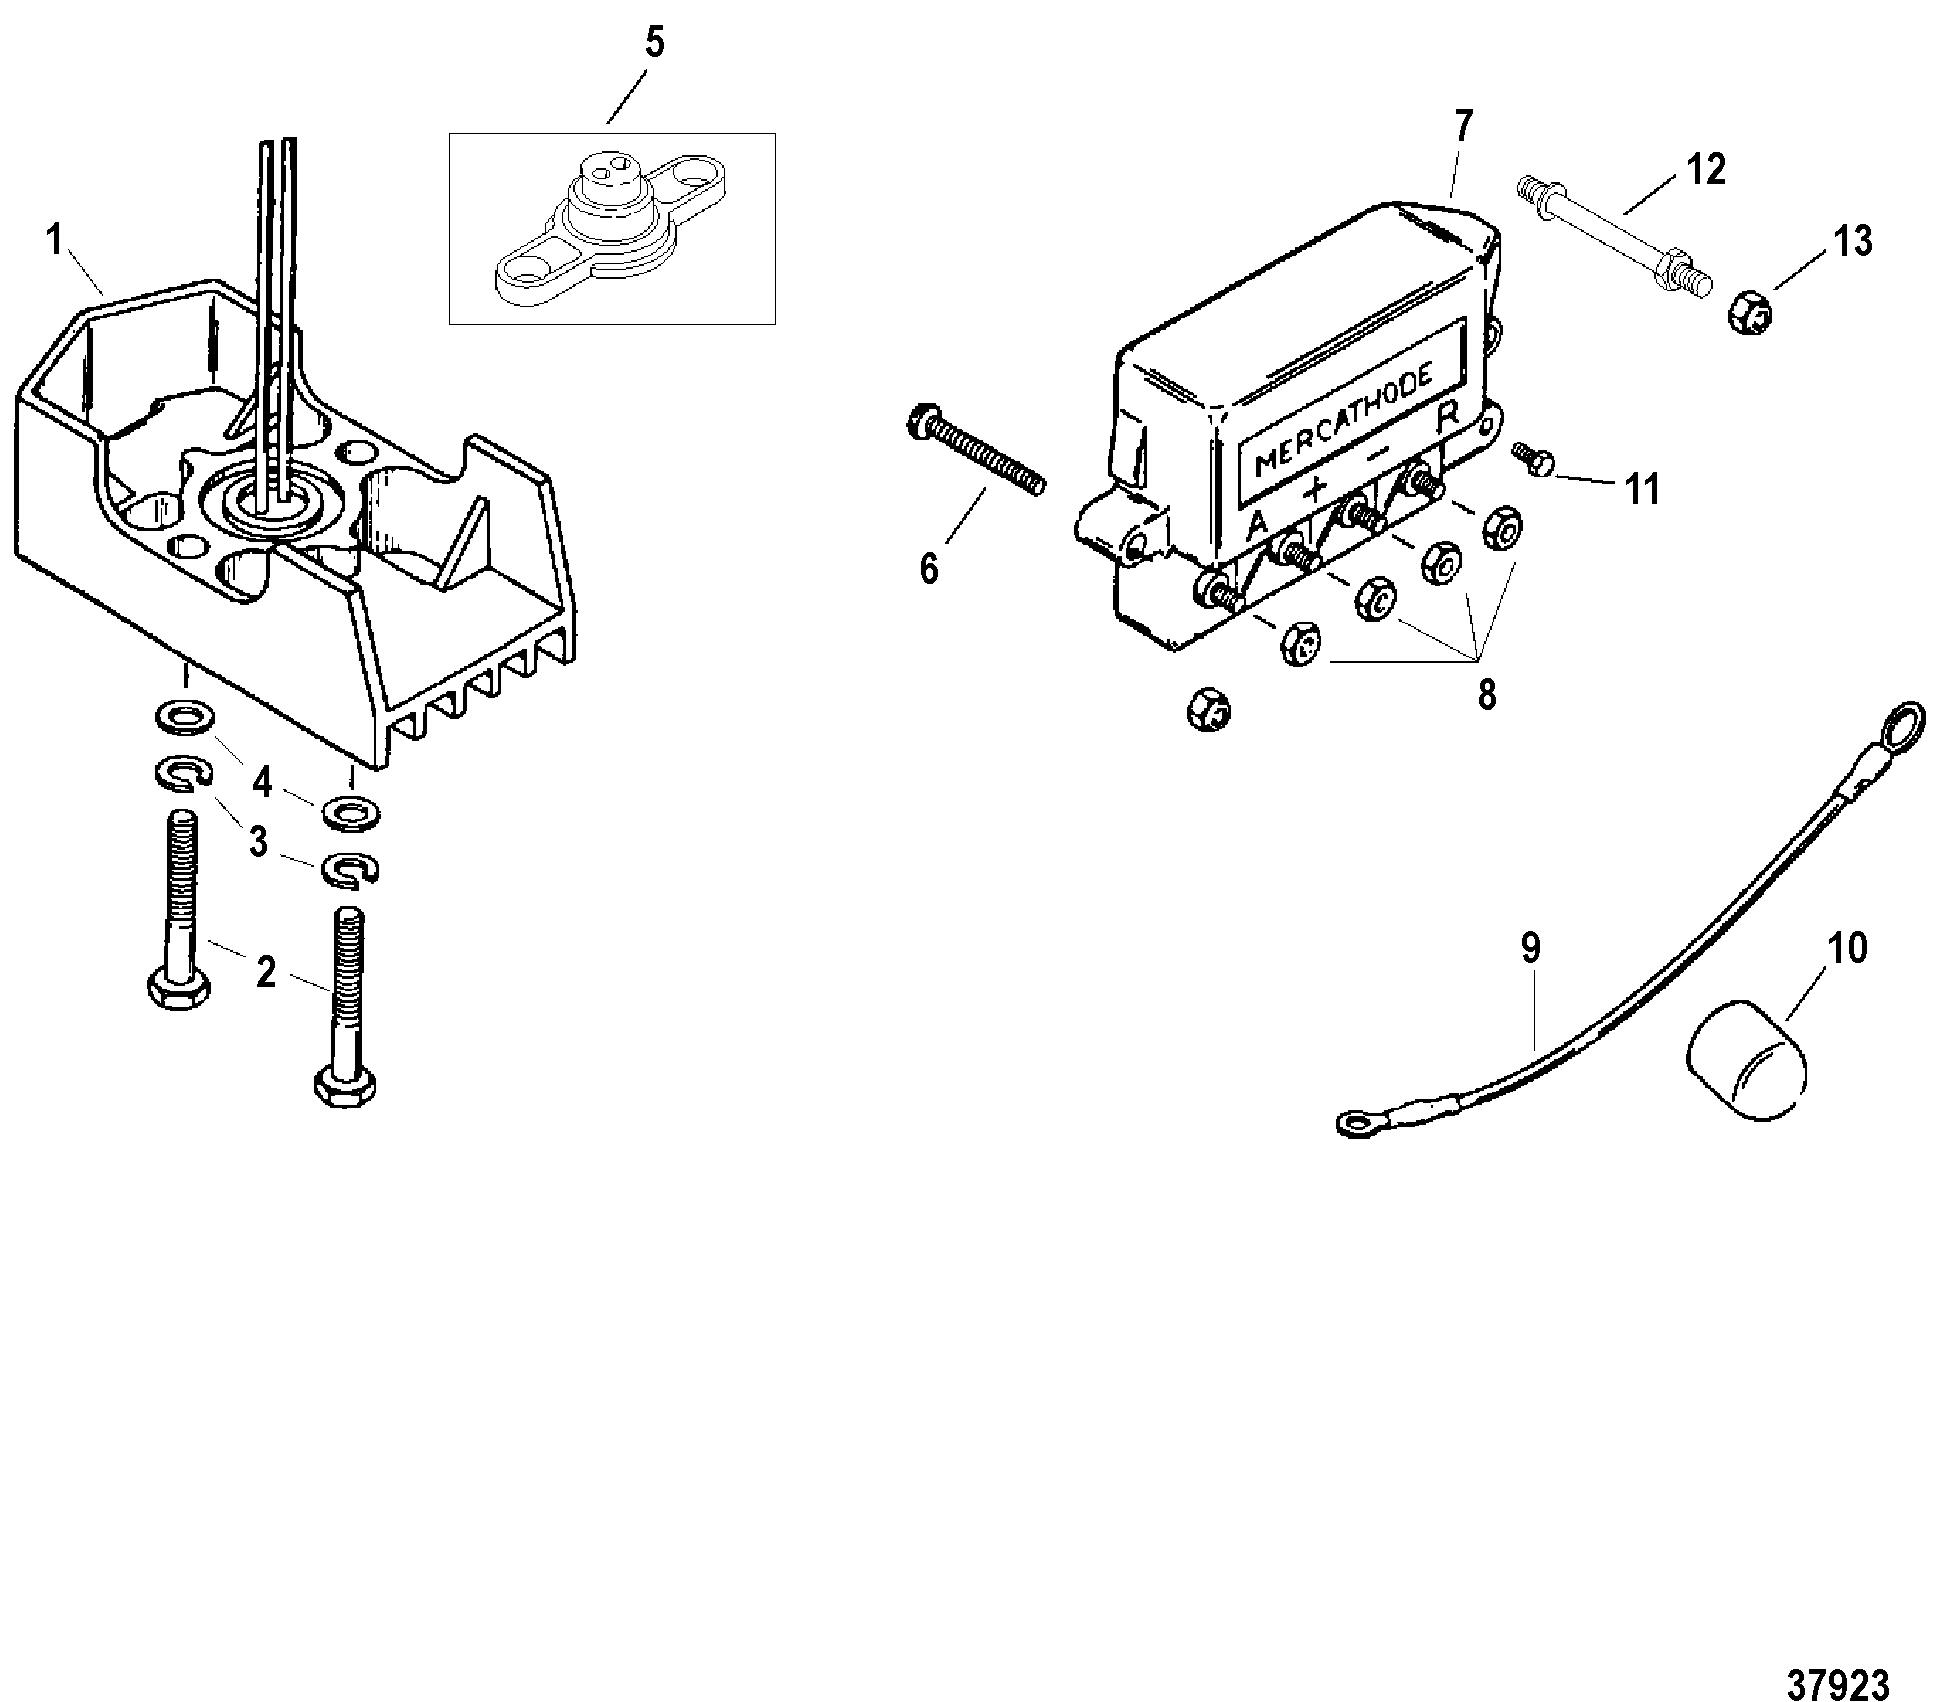 Mercathode Components For Mercruiser 7 4l Bravo I  Ii  Iii  Engine